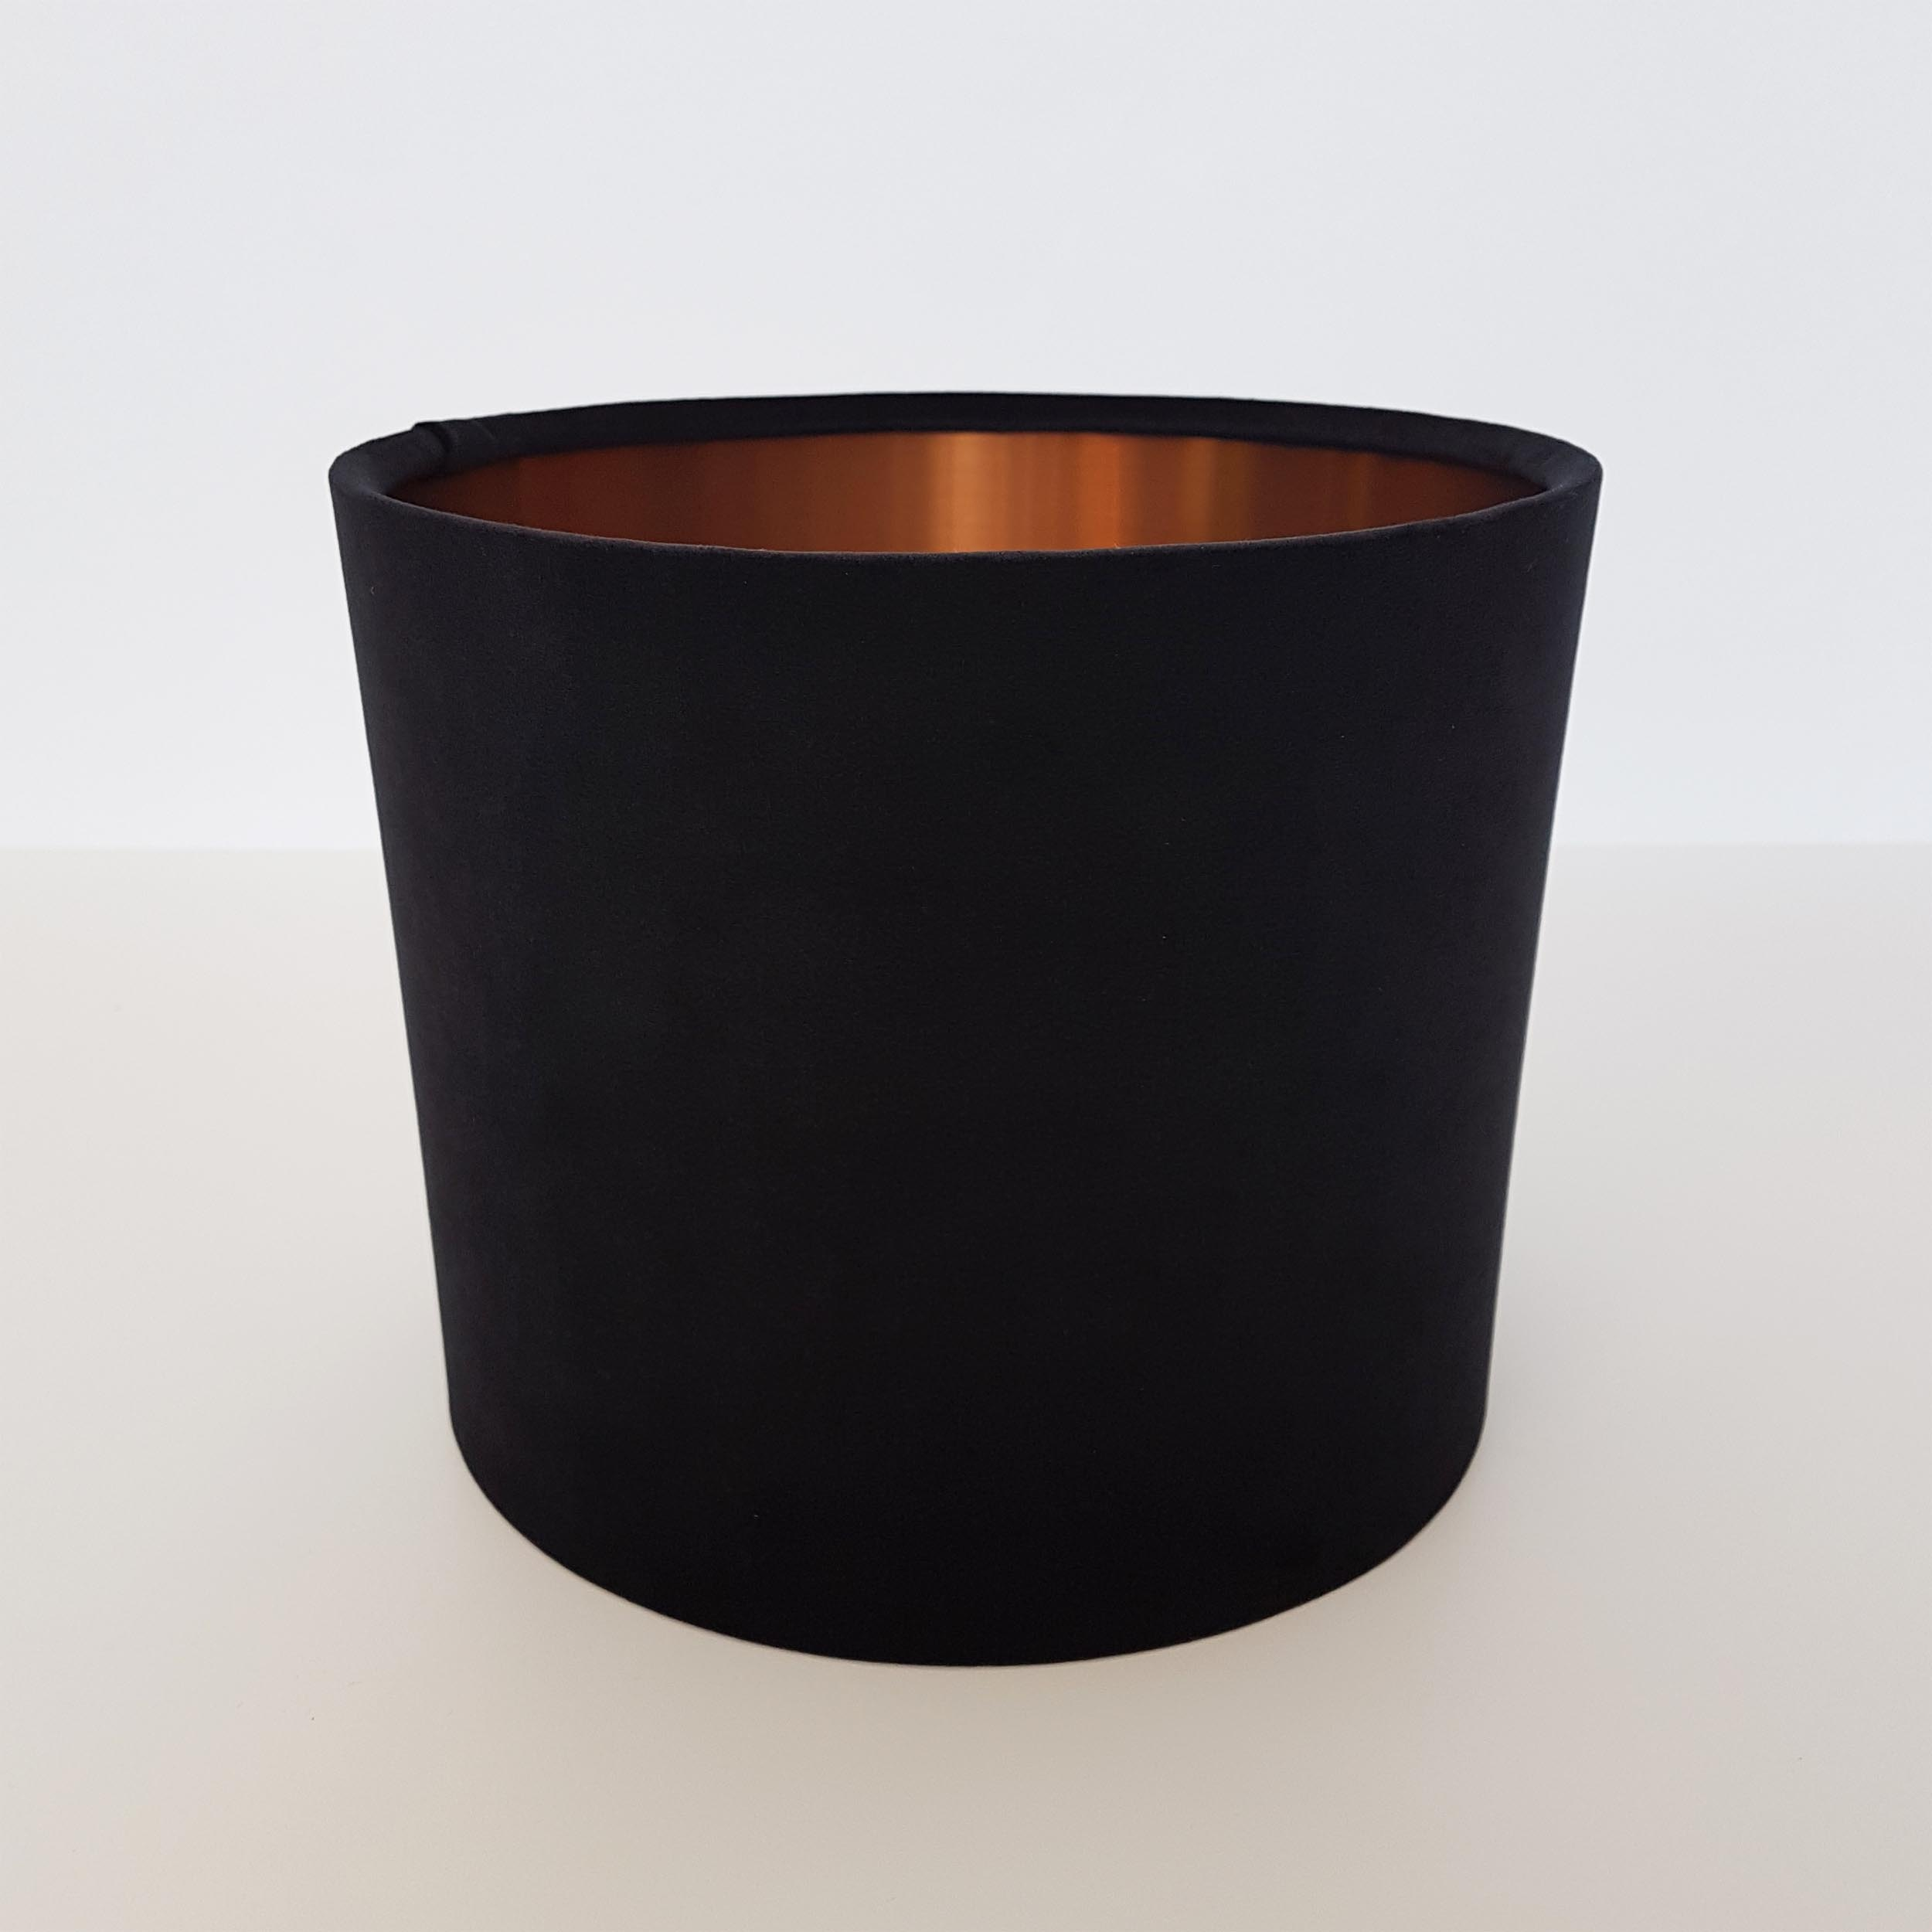 Black Velvet and Brushed Copper Lampshade